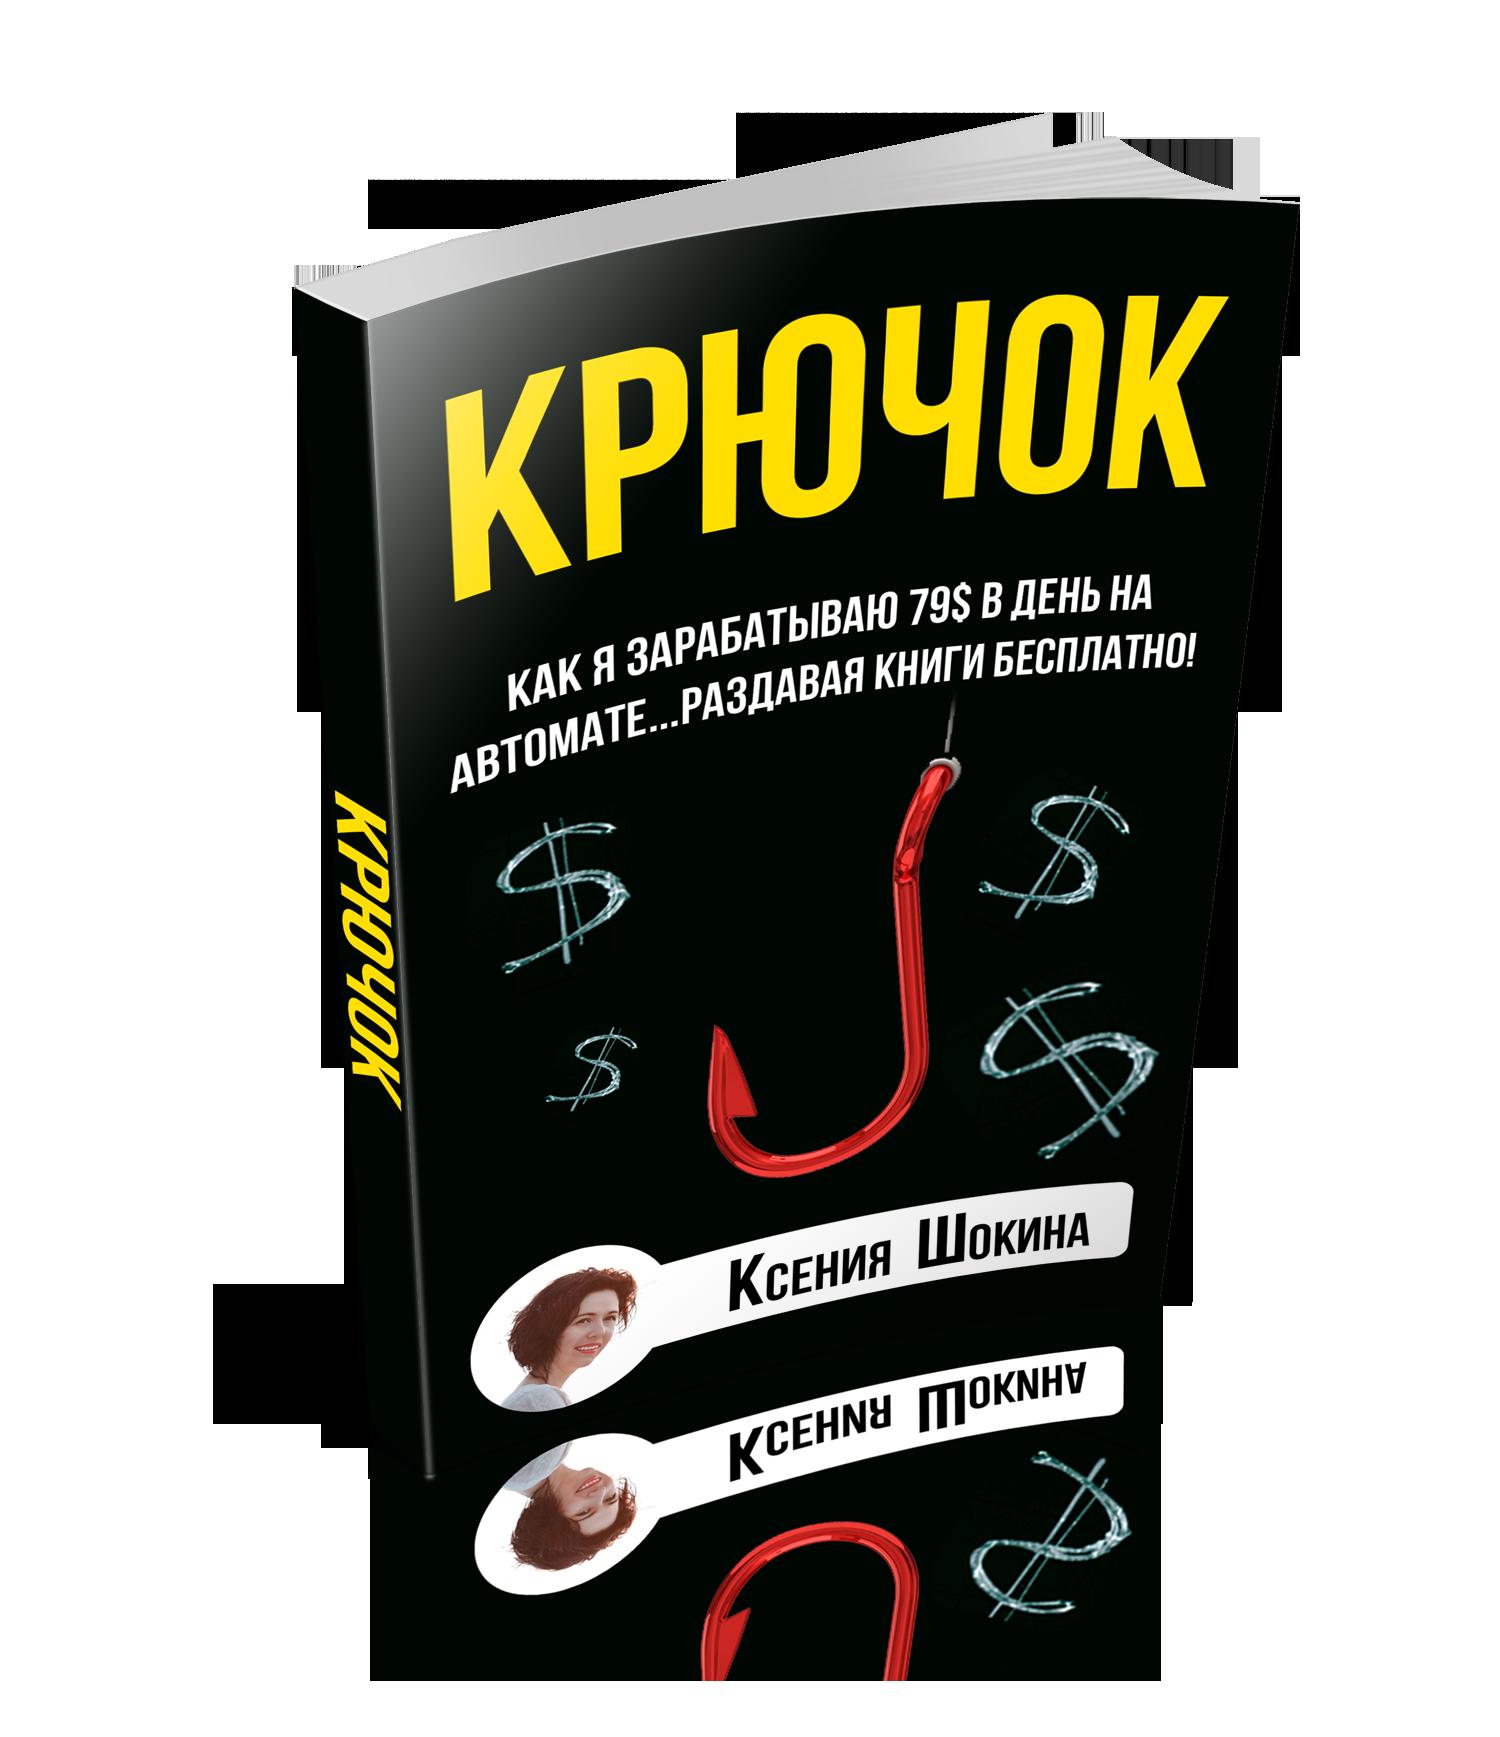 https://glopart.ru/uploads/images/71261/fd9fd75b2fcd475bb445b1198f5d084b.png